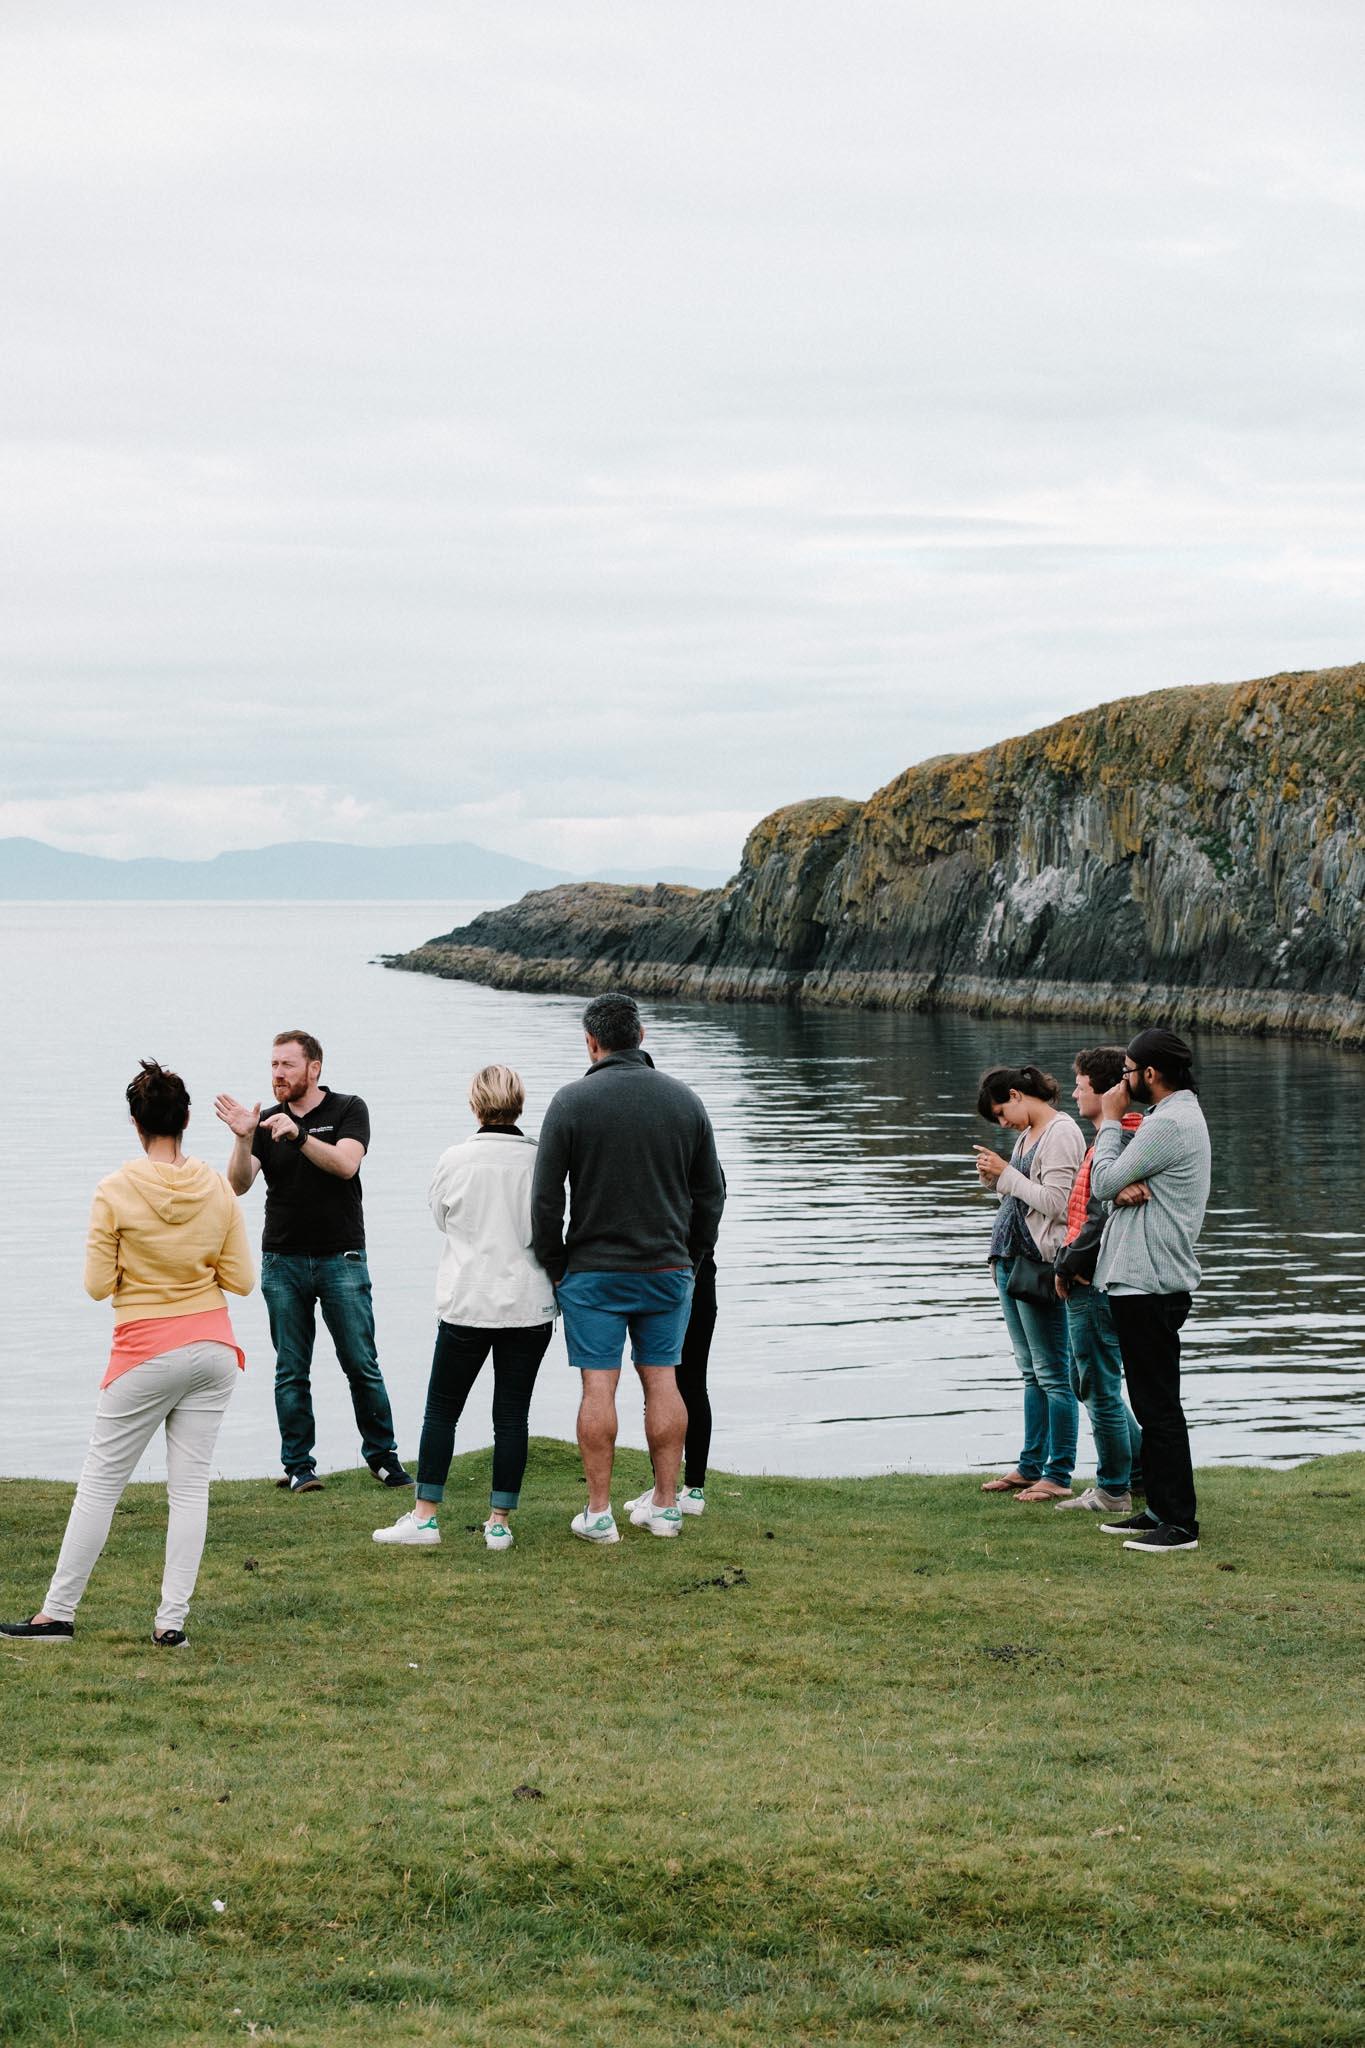 Highland Explorer Tours-160724-164955.jpg